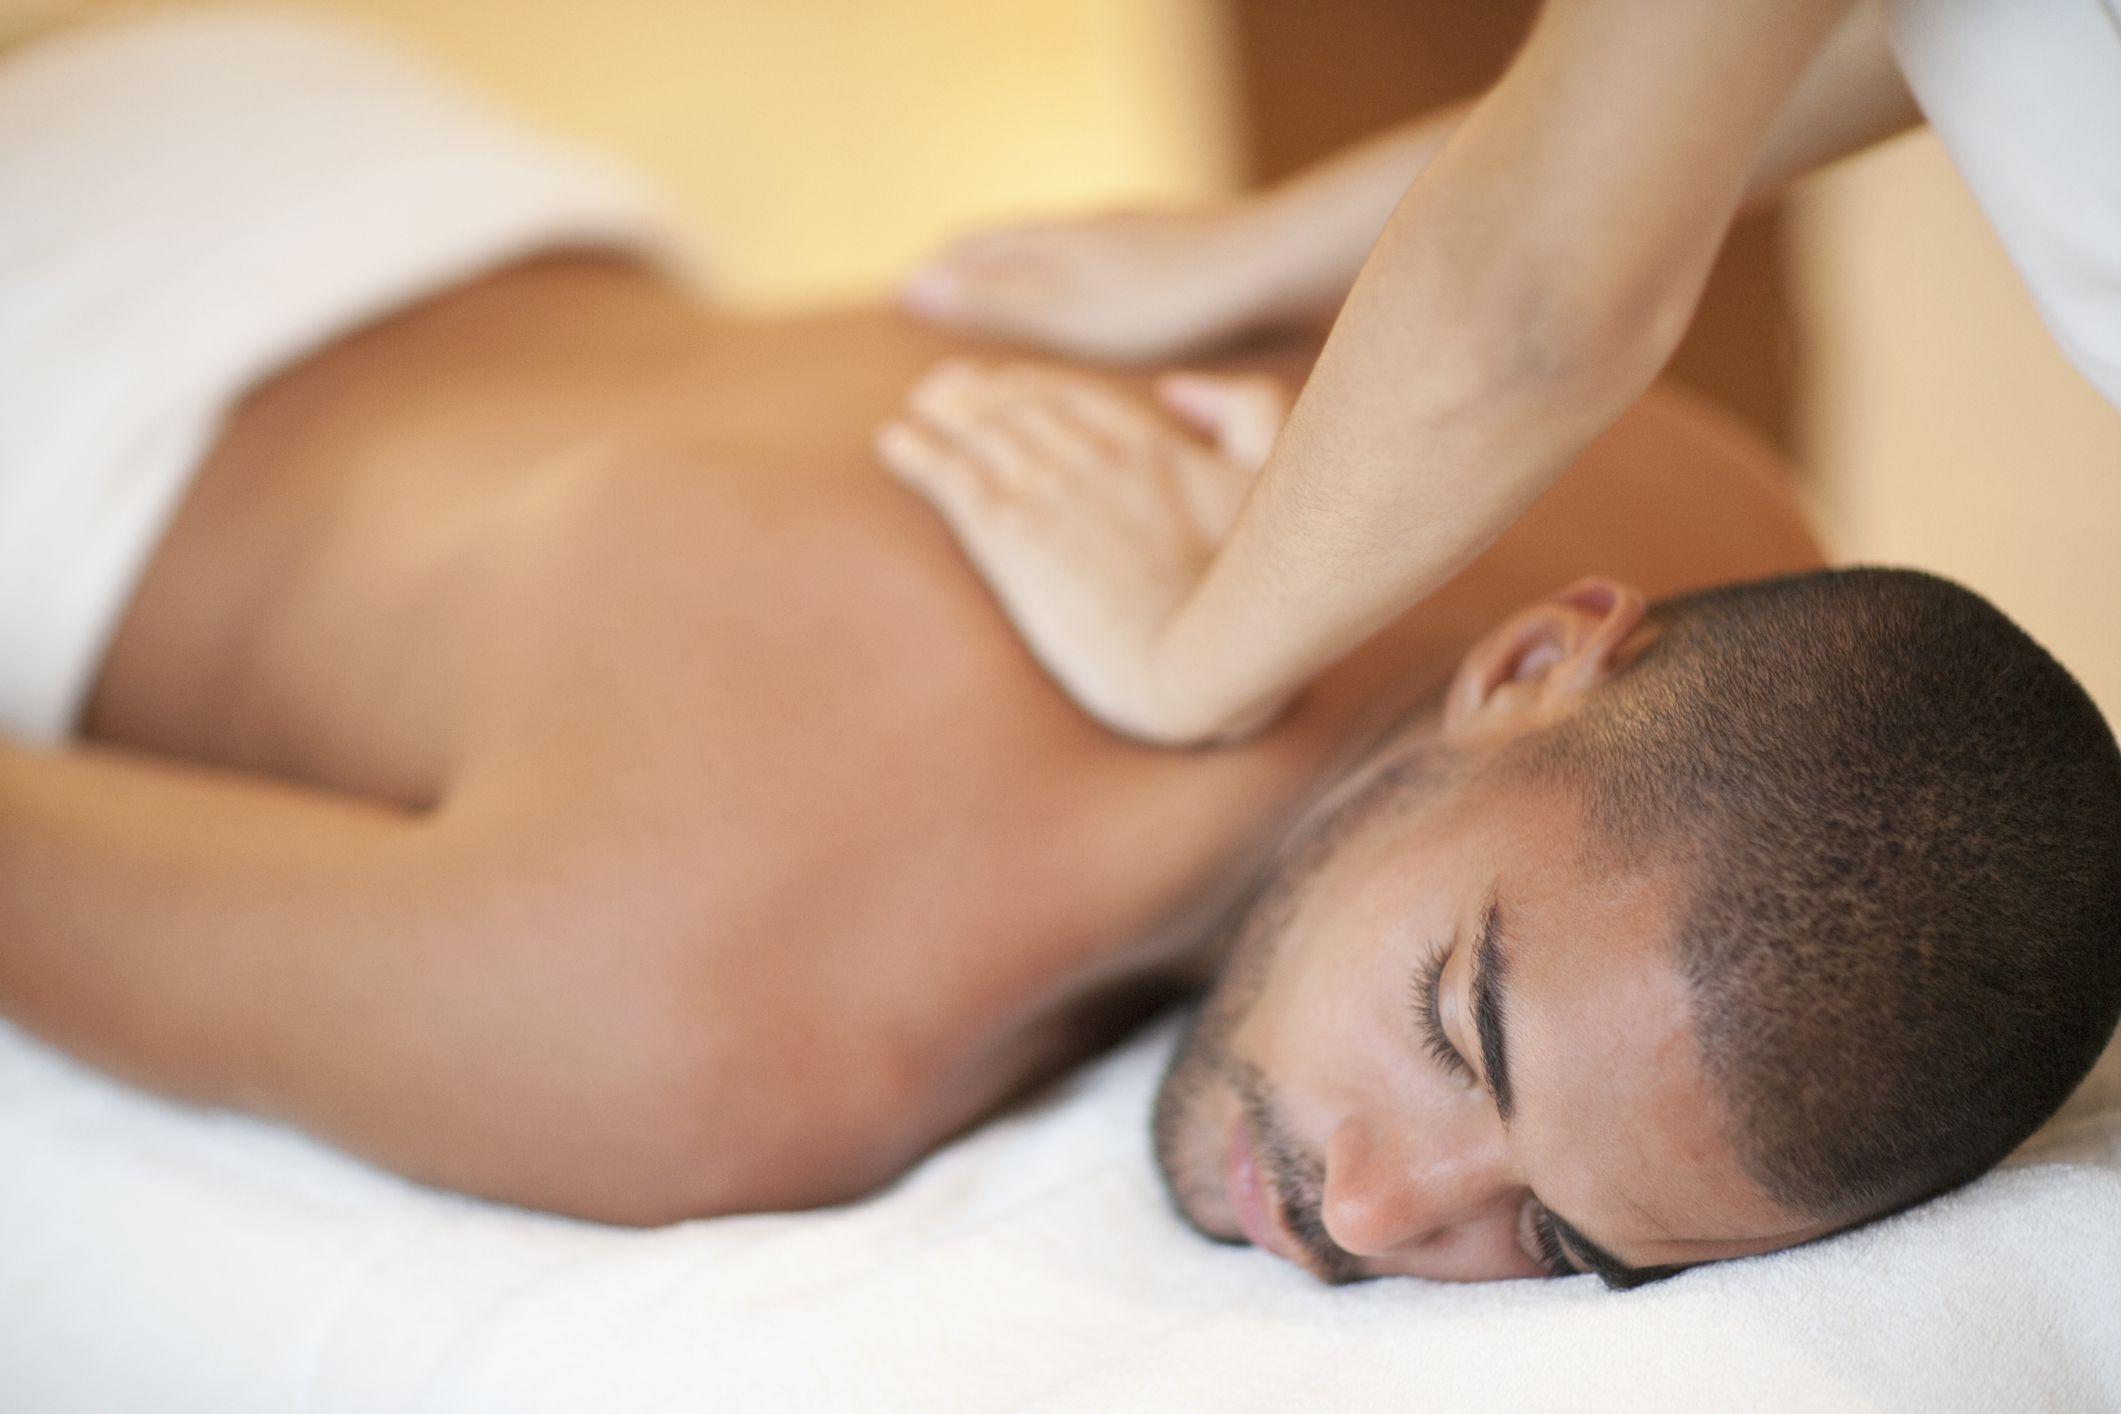 Massage erotic central america